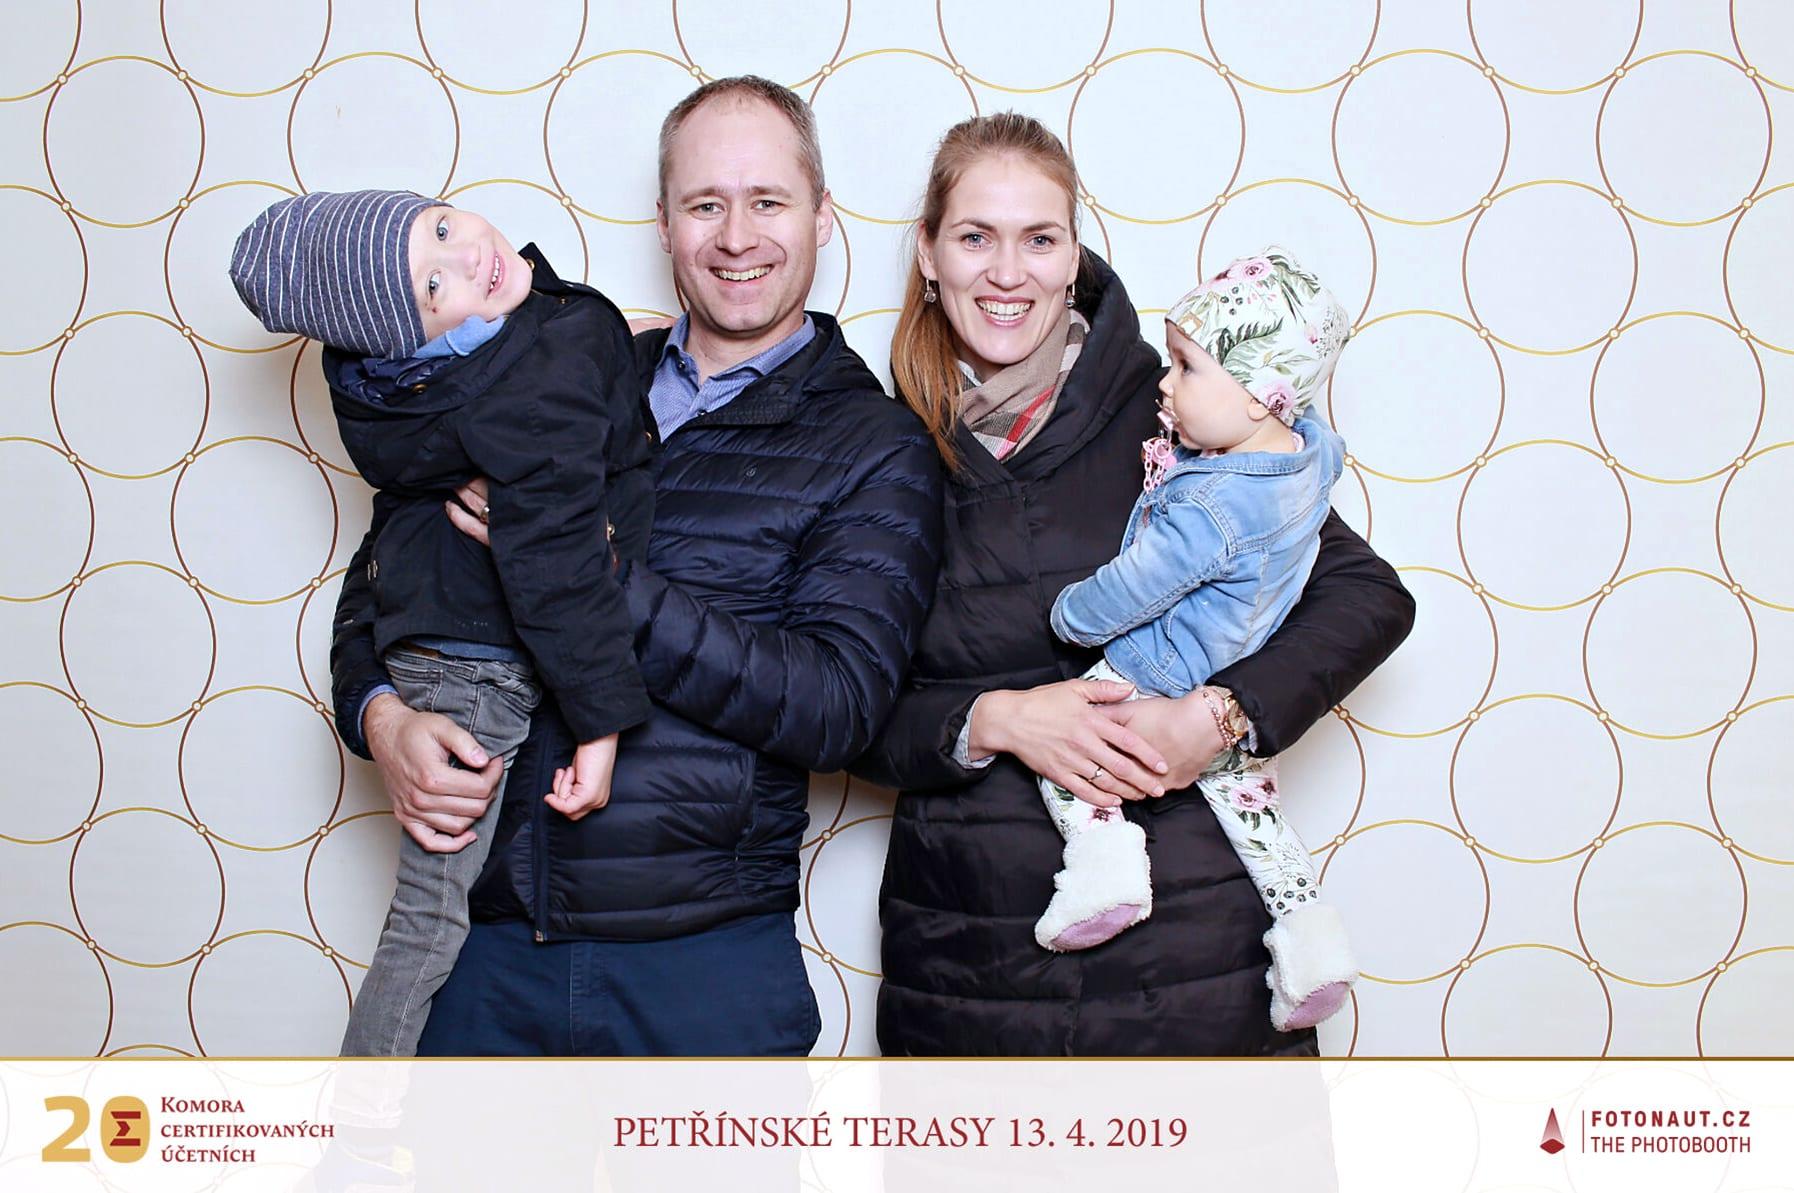 fotokoutek-komora-certifikovanych-ucetnich-13-4-2019-595088